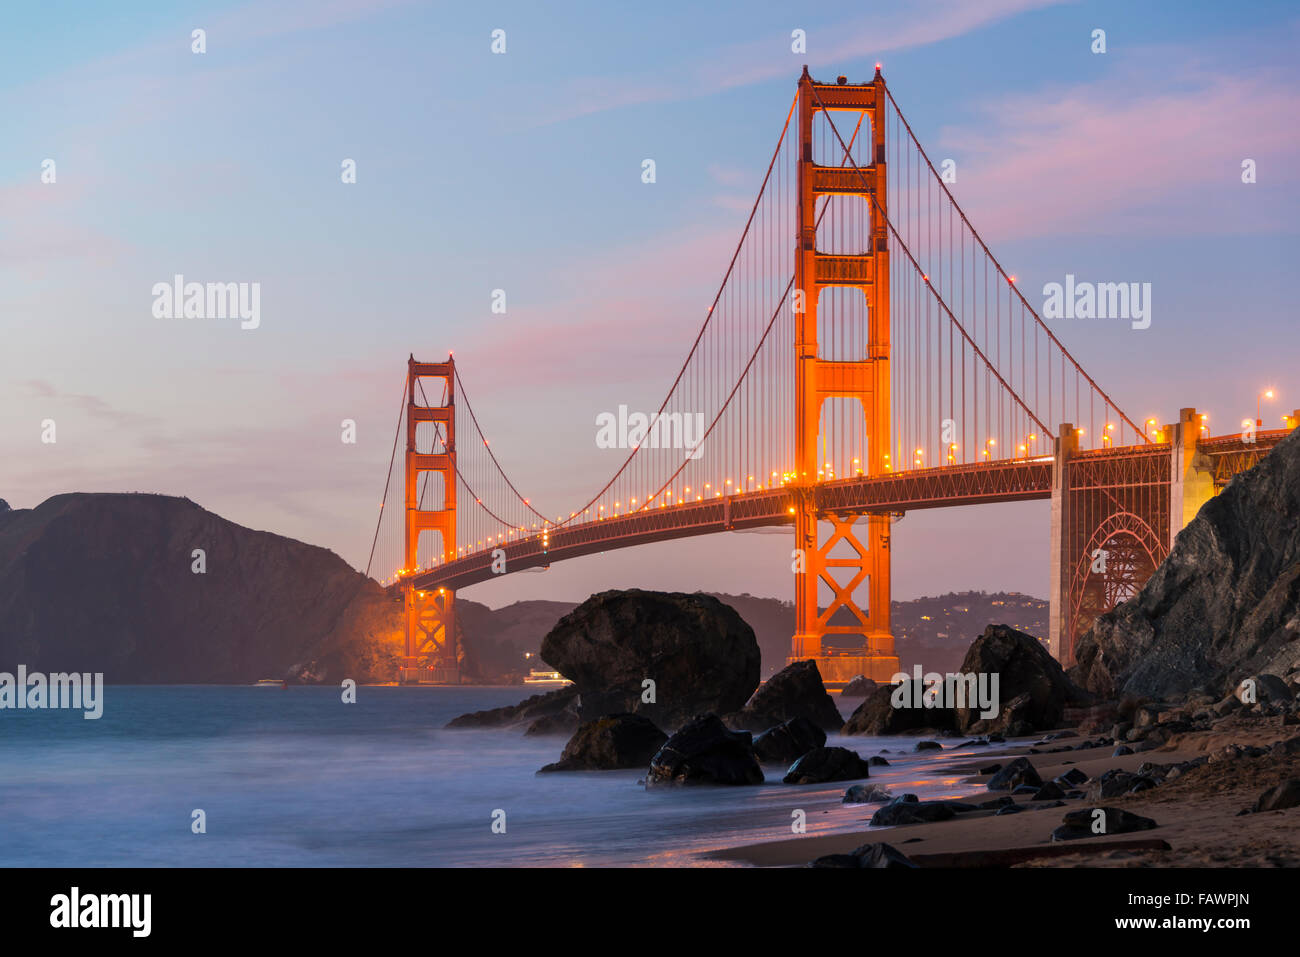 Golden Gate Bridge, Marshall's beach, nuit, côte rocheuse, San Francisco, États-Unis Photo Stock